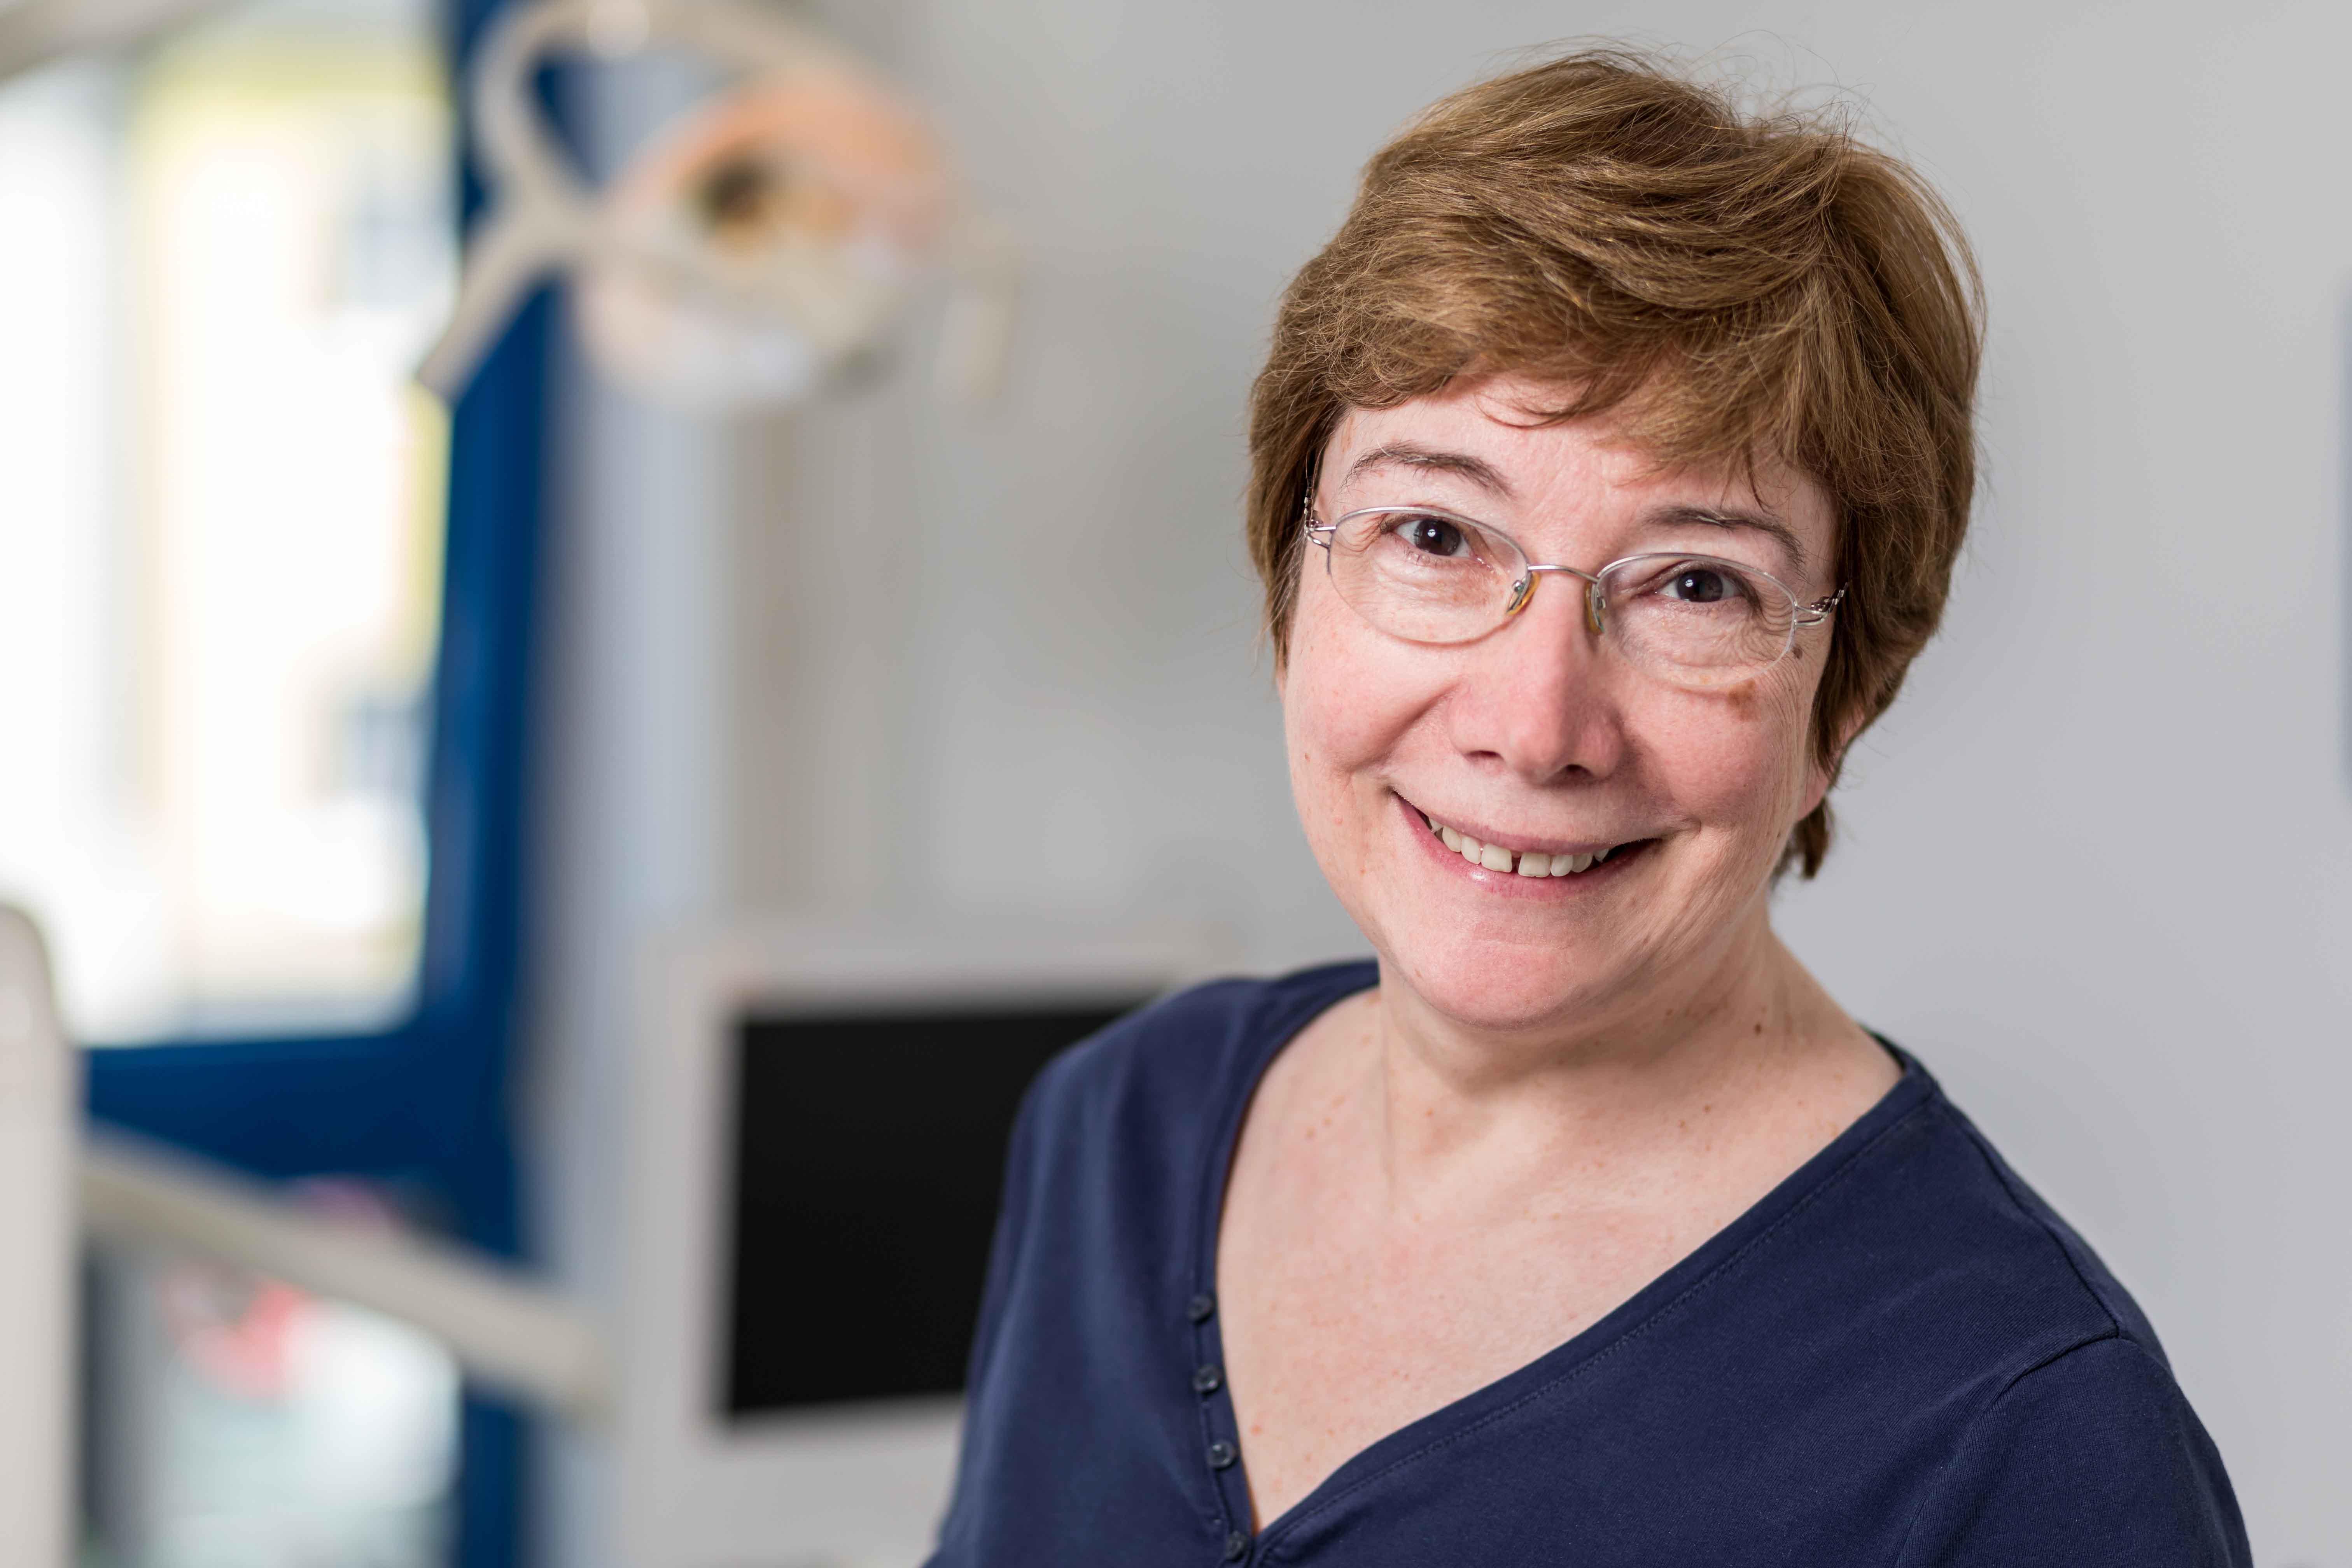 Zahnärztin Dr. Beroniade Köln